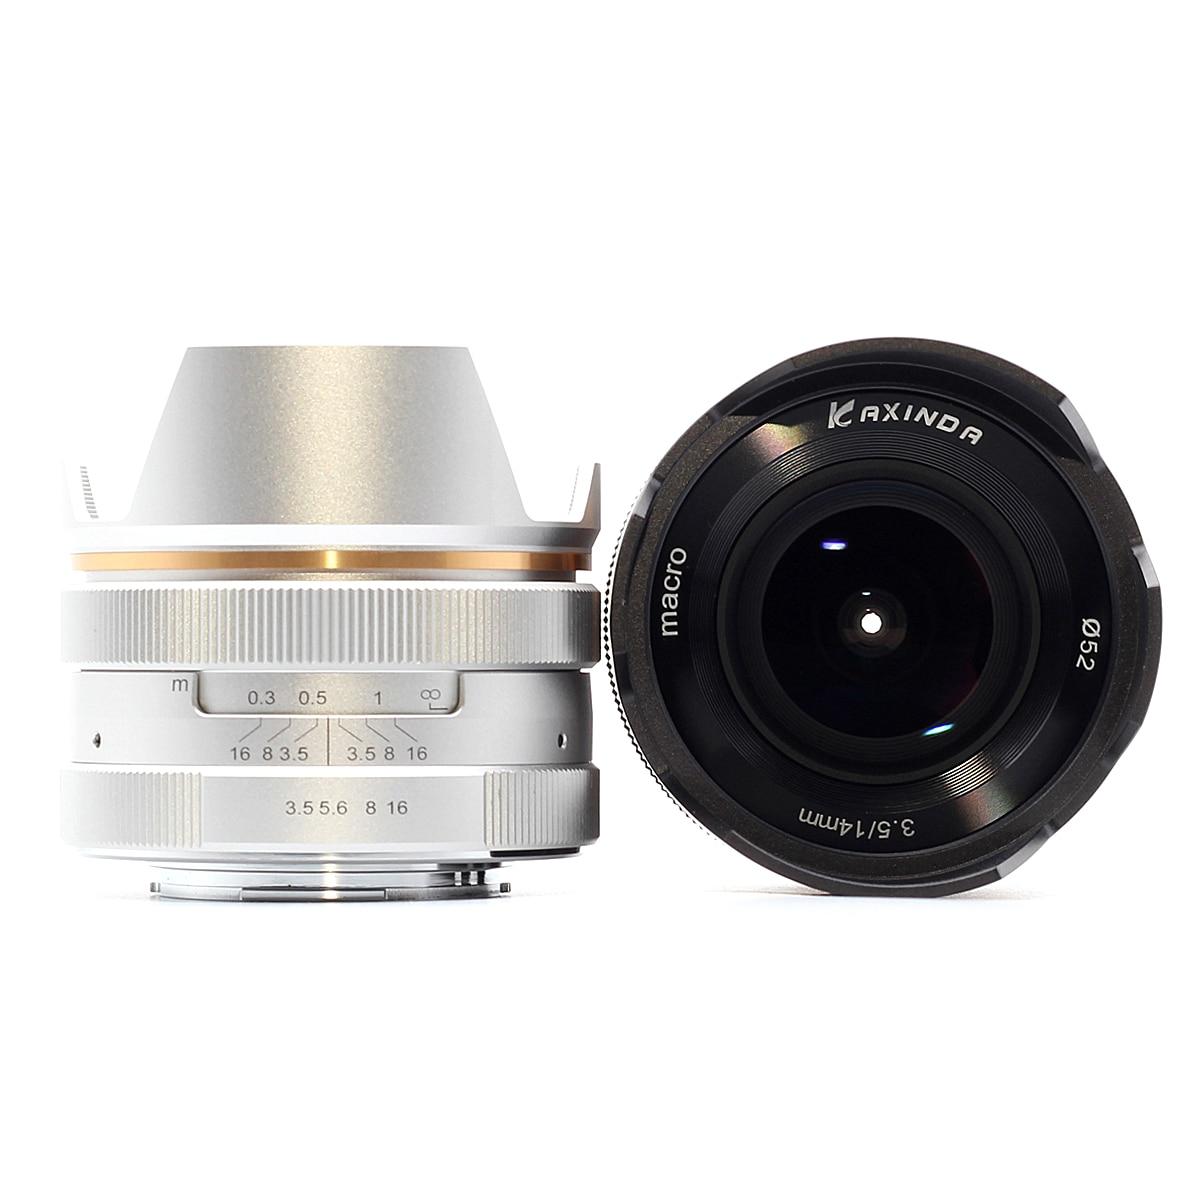 14mm f/3.5 Manuel lentille principale pour Sony Monture E NEX Canon EF-M EOS M Fujifilm FX X Olympus pansonic M43 MFT Micro4/3 14mm F3.5